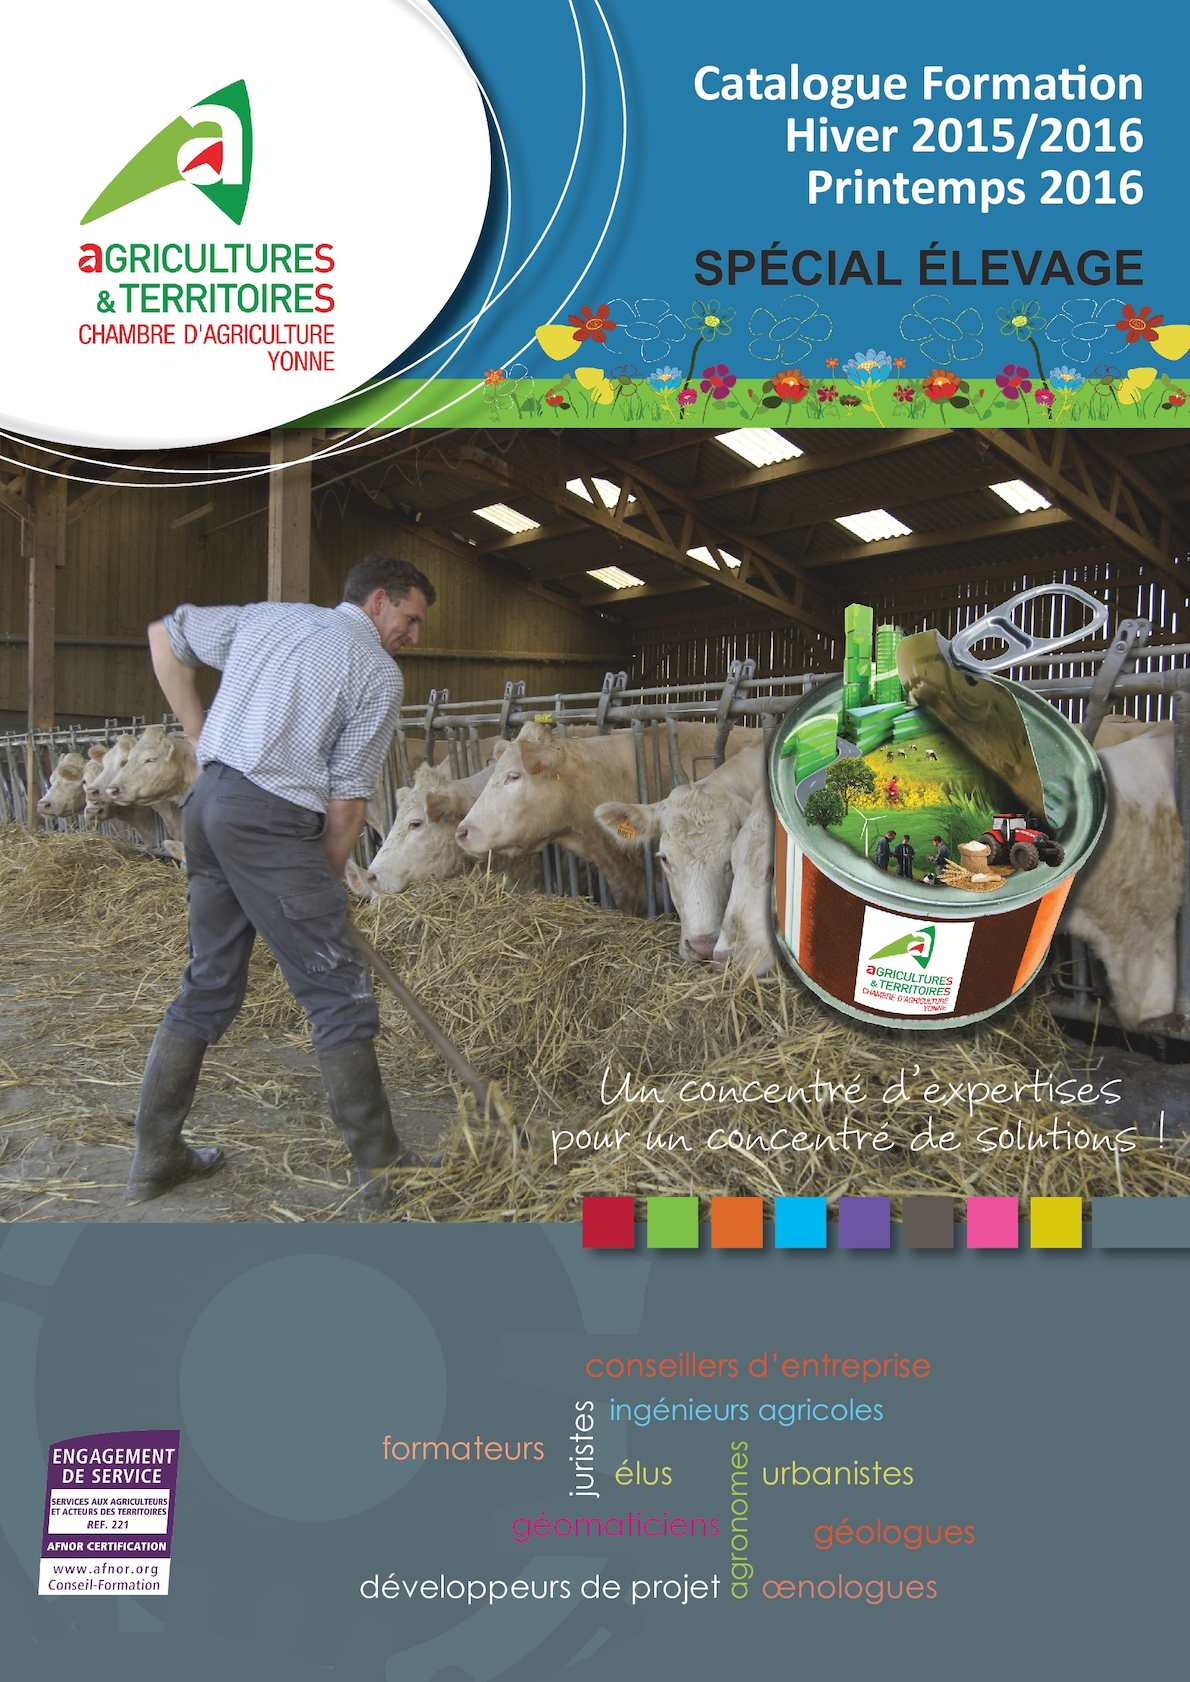 Calam o cata elevage hiver 2015 printemps 2016 - Chambre agriculture yonne ...